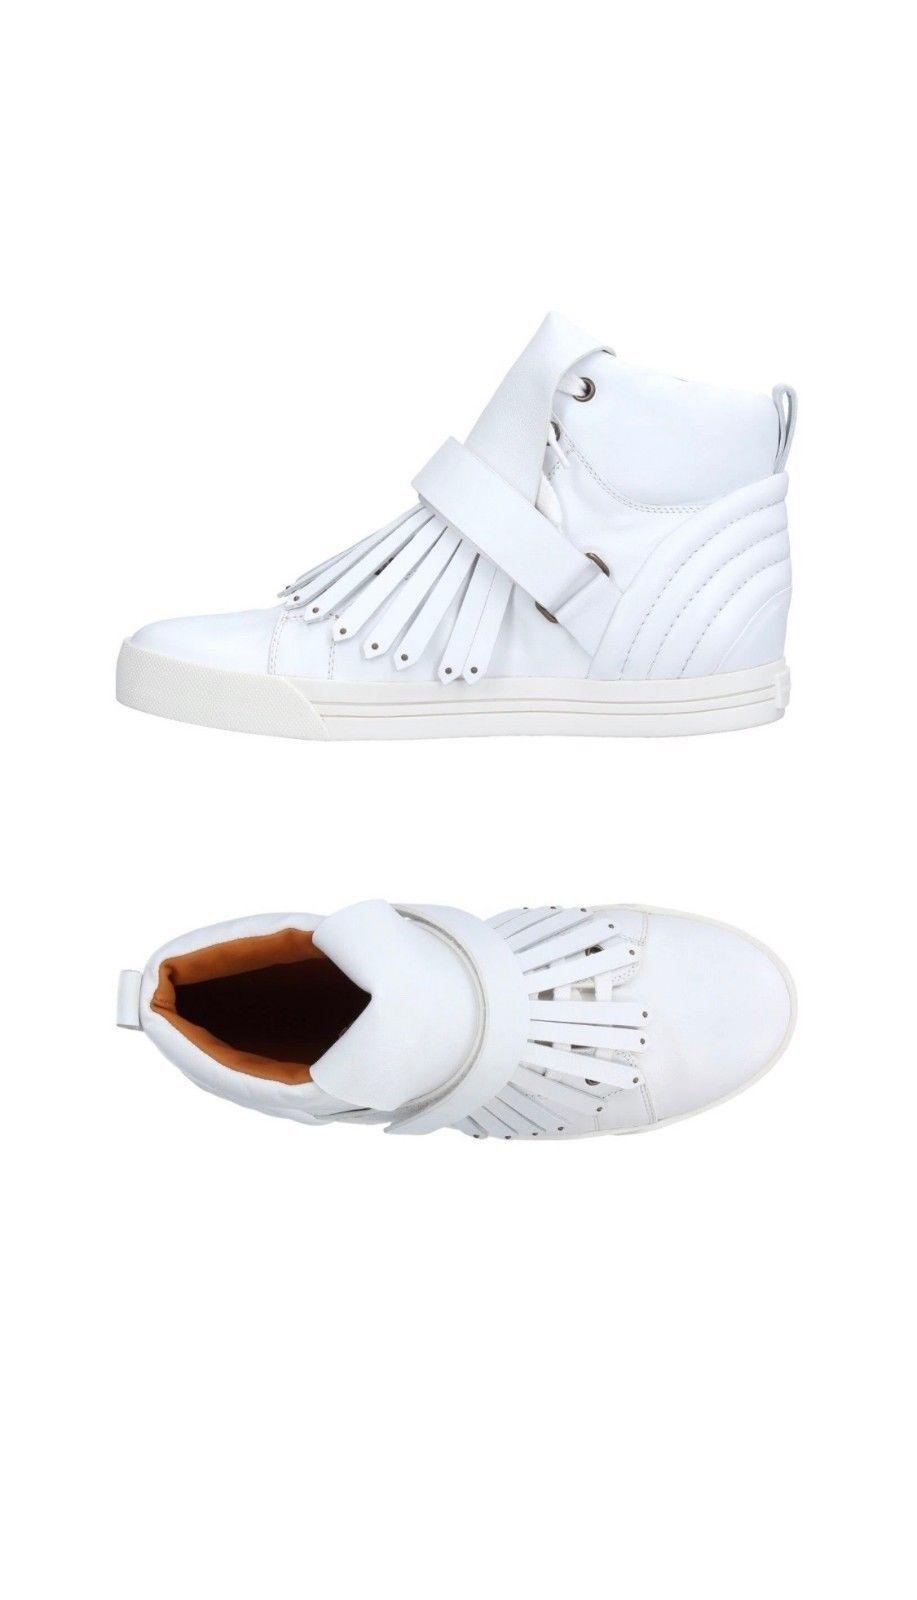 Marc Jacobs Auth bianca High  -Tops scarpe da ginnastica Soft Leather donna Dimensione 9US 39EU NWB  articoli promozionali